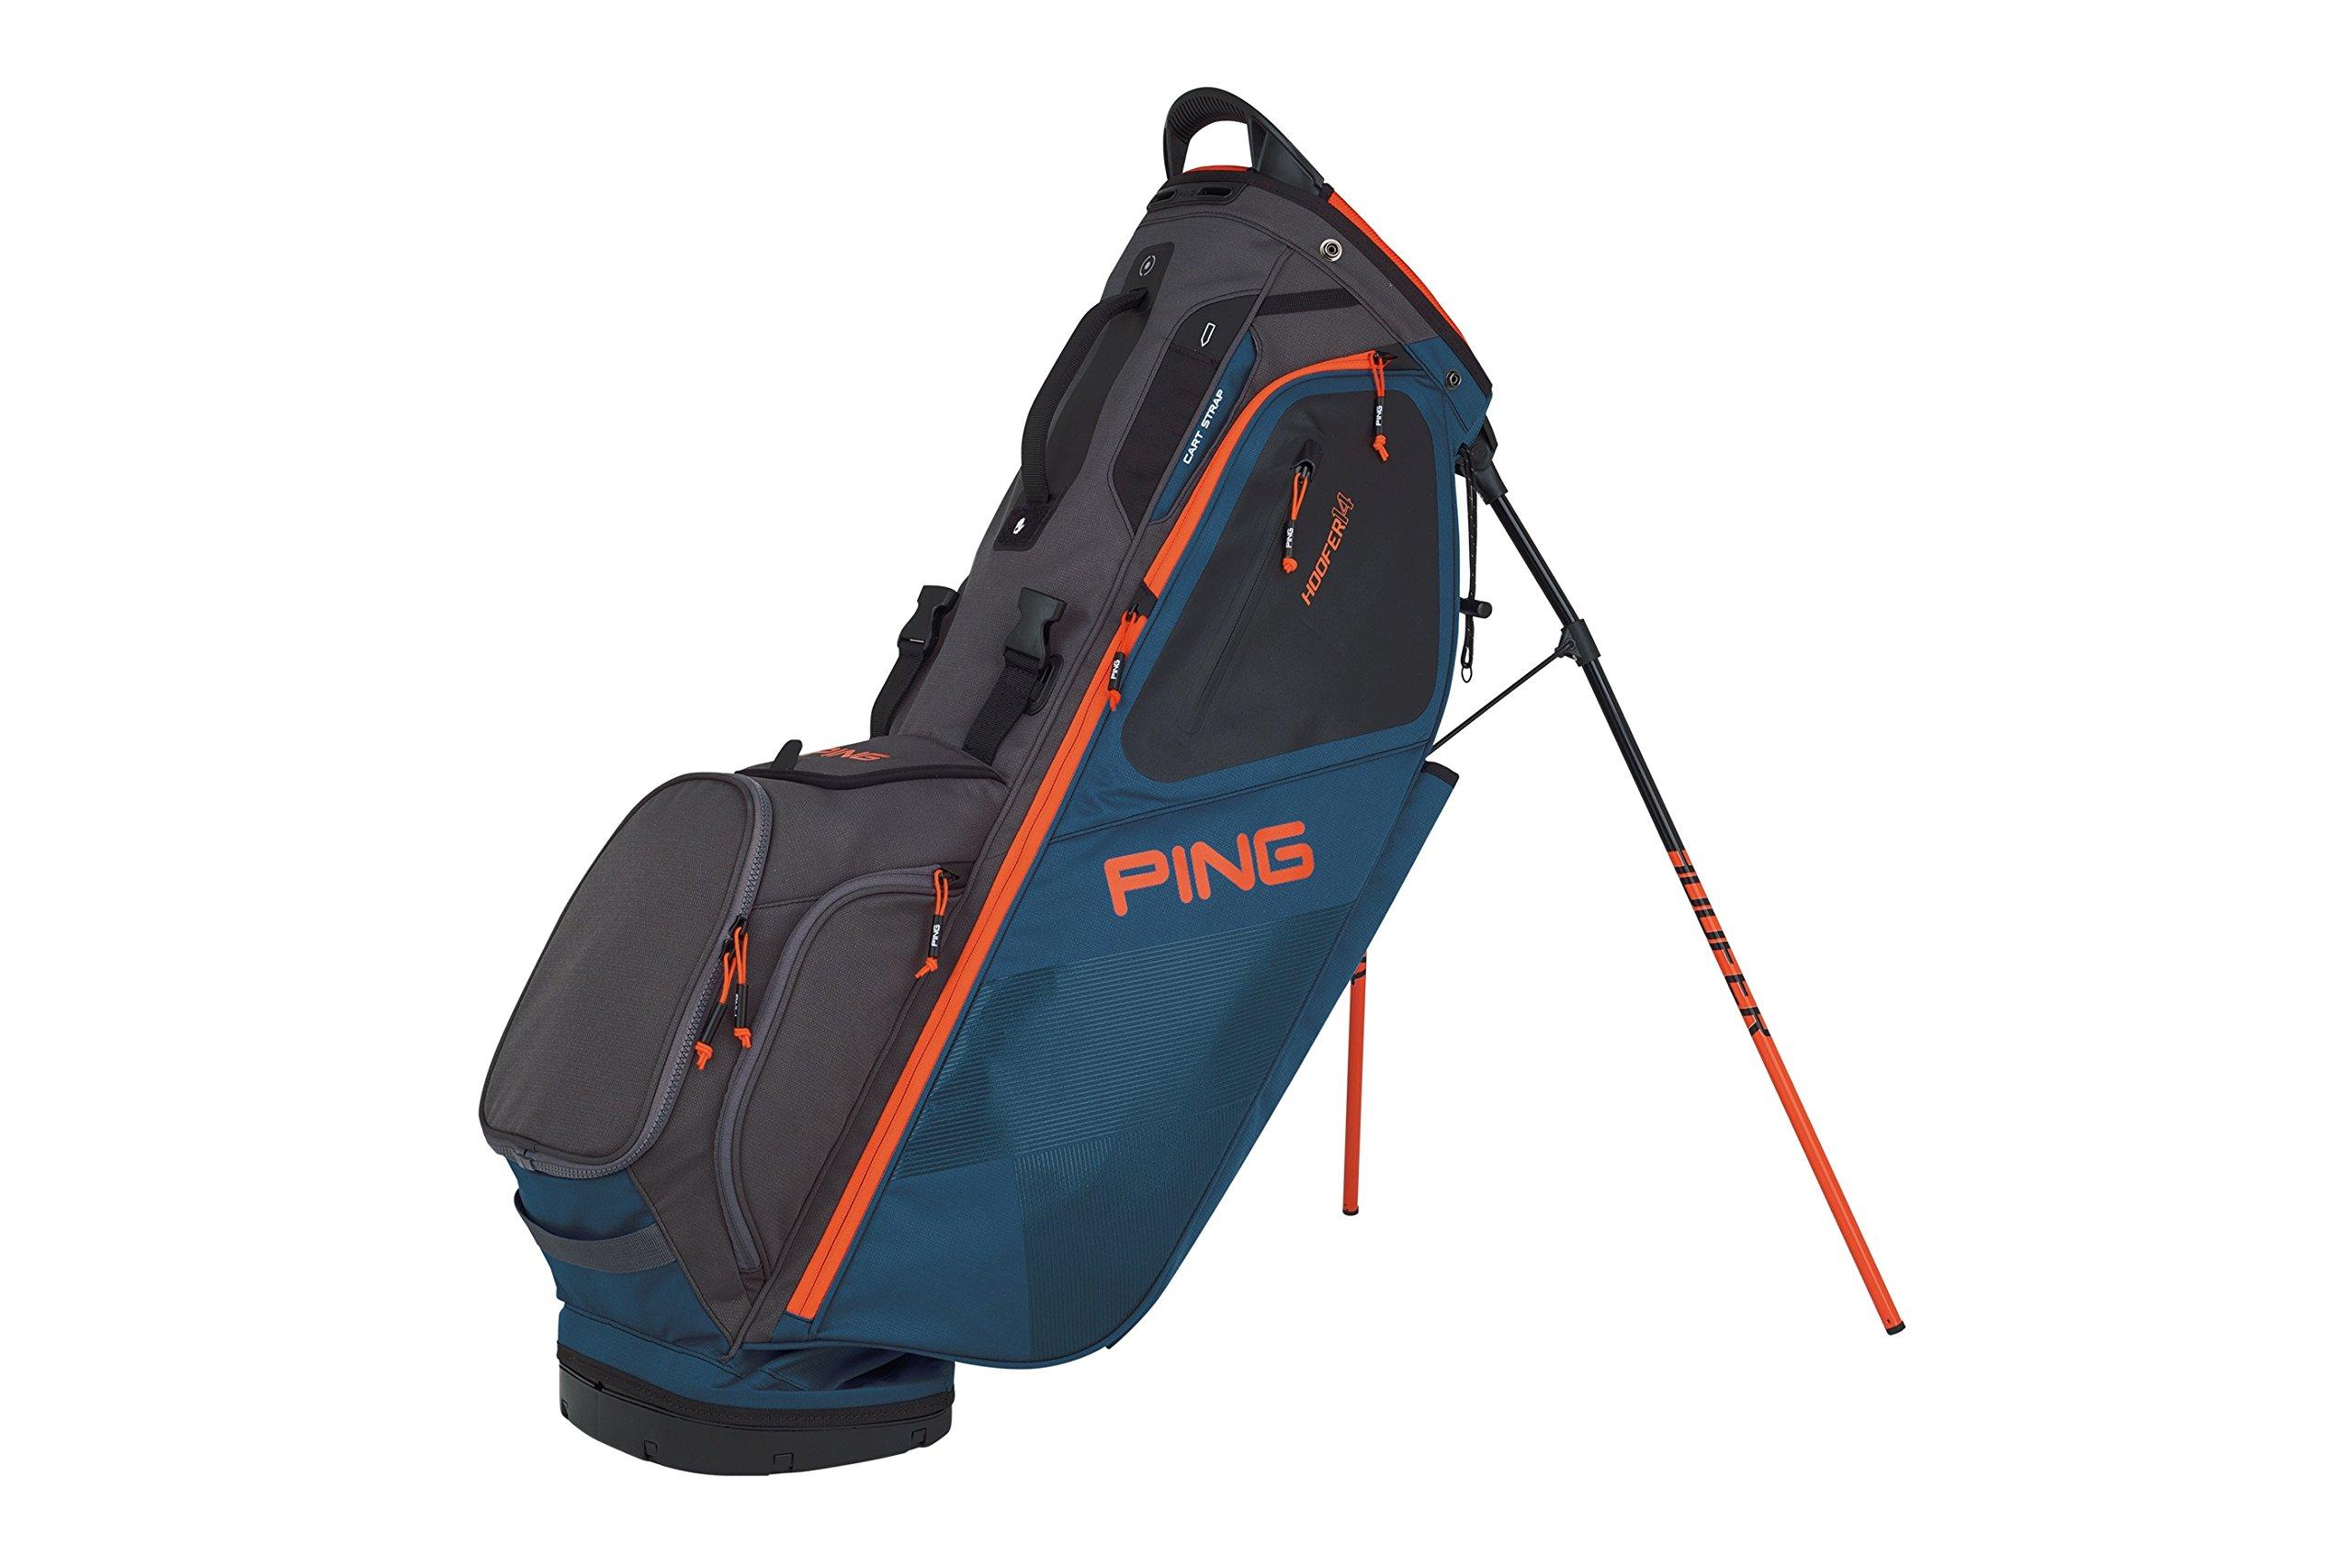 PING 2018 HOOFER 14 181 STAND GOLF BAG 07 DARK TEAL/GRAPHITE/ORANGE by Ping (Image #1)